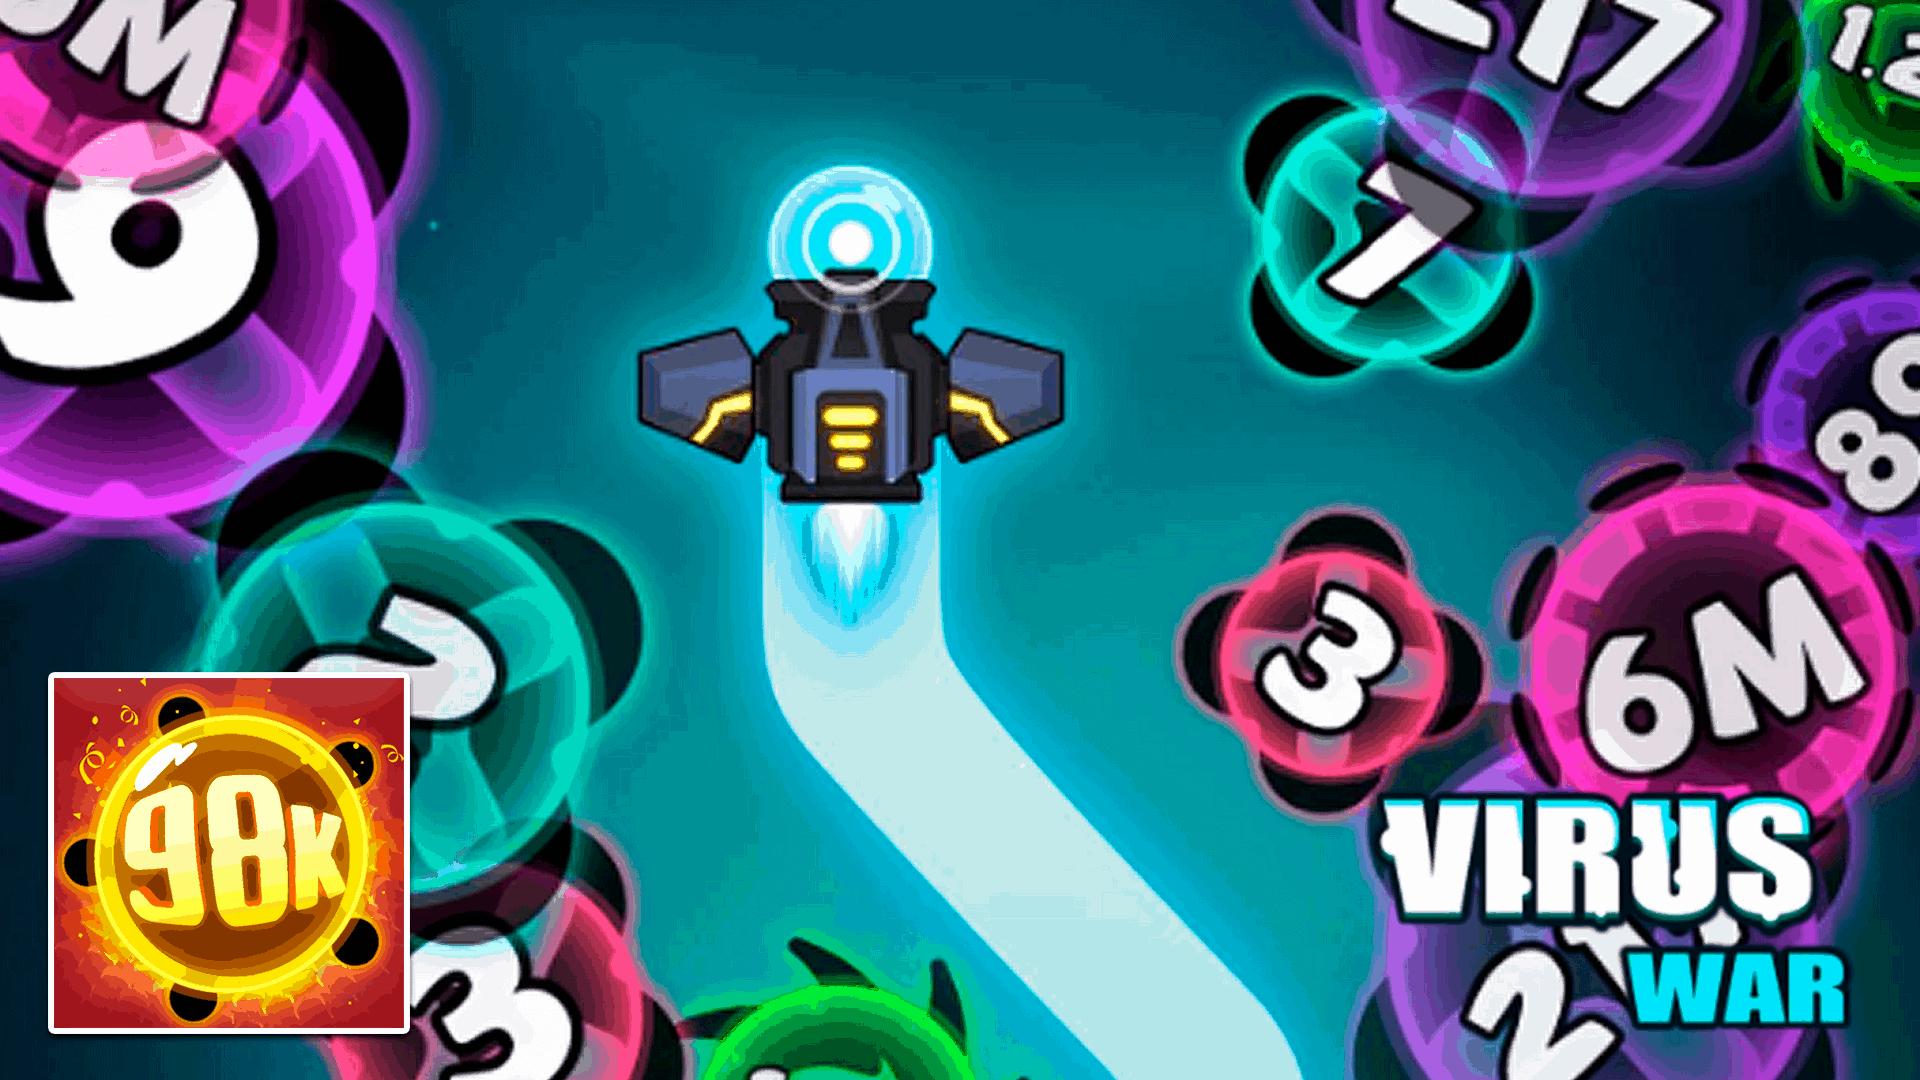 Virus War – Mobile Game Guide – Tips & Tricks To Beat The Viruses